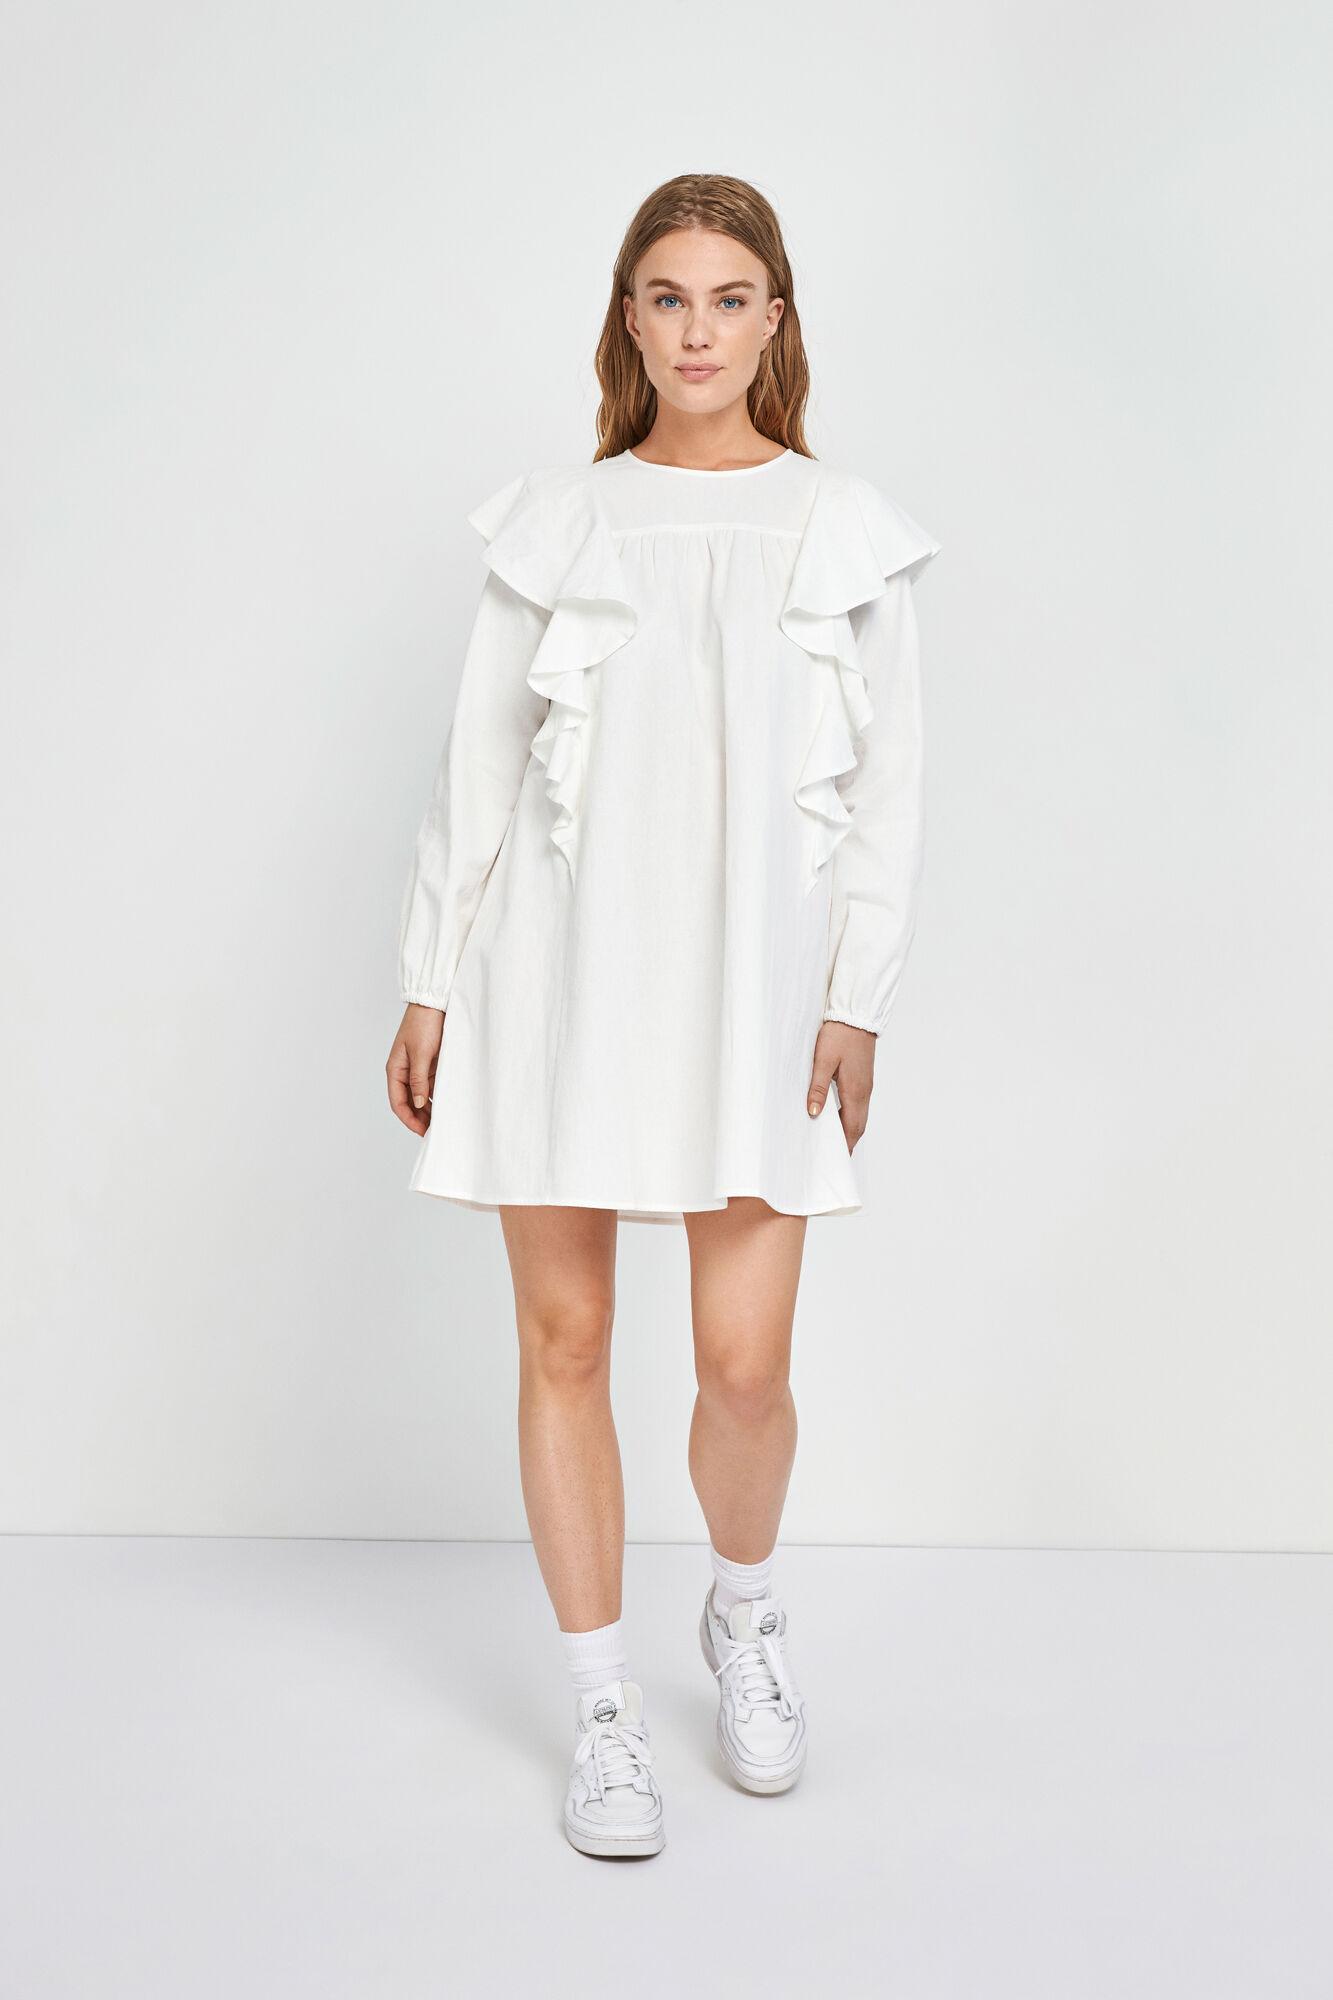 ENSALOON LS DRESS 6753